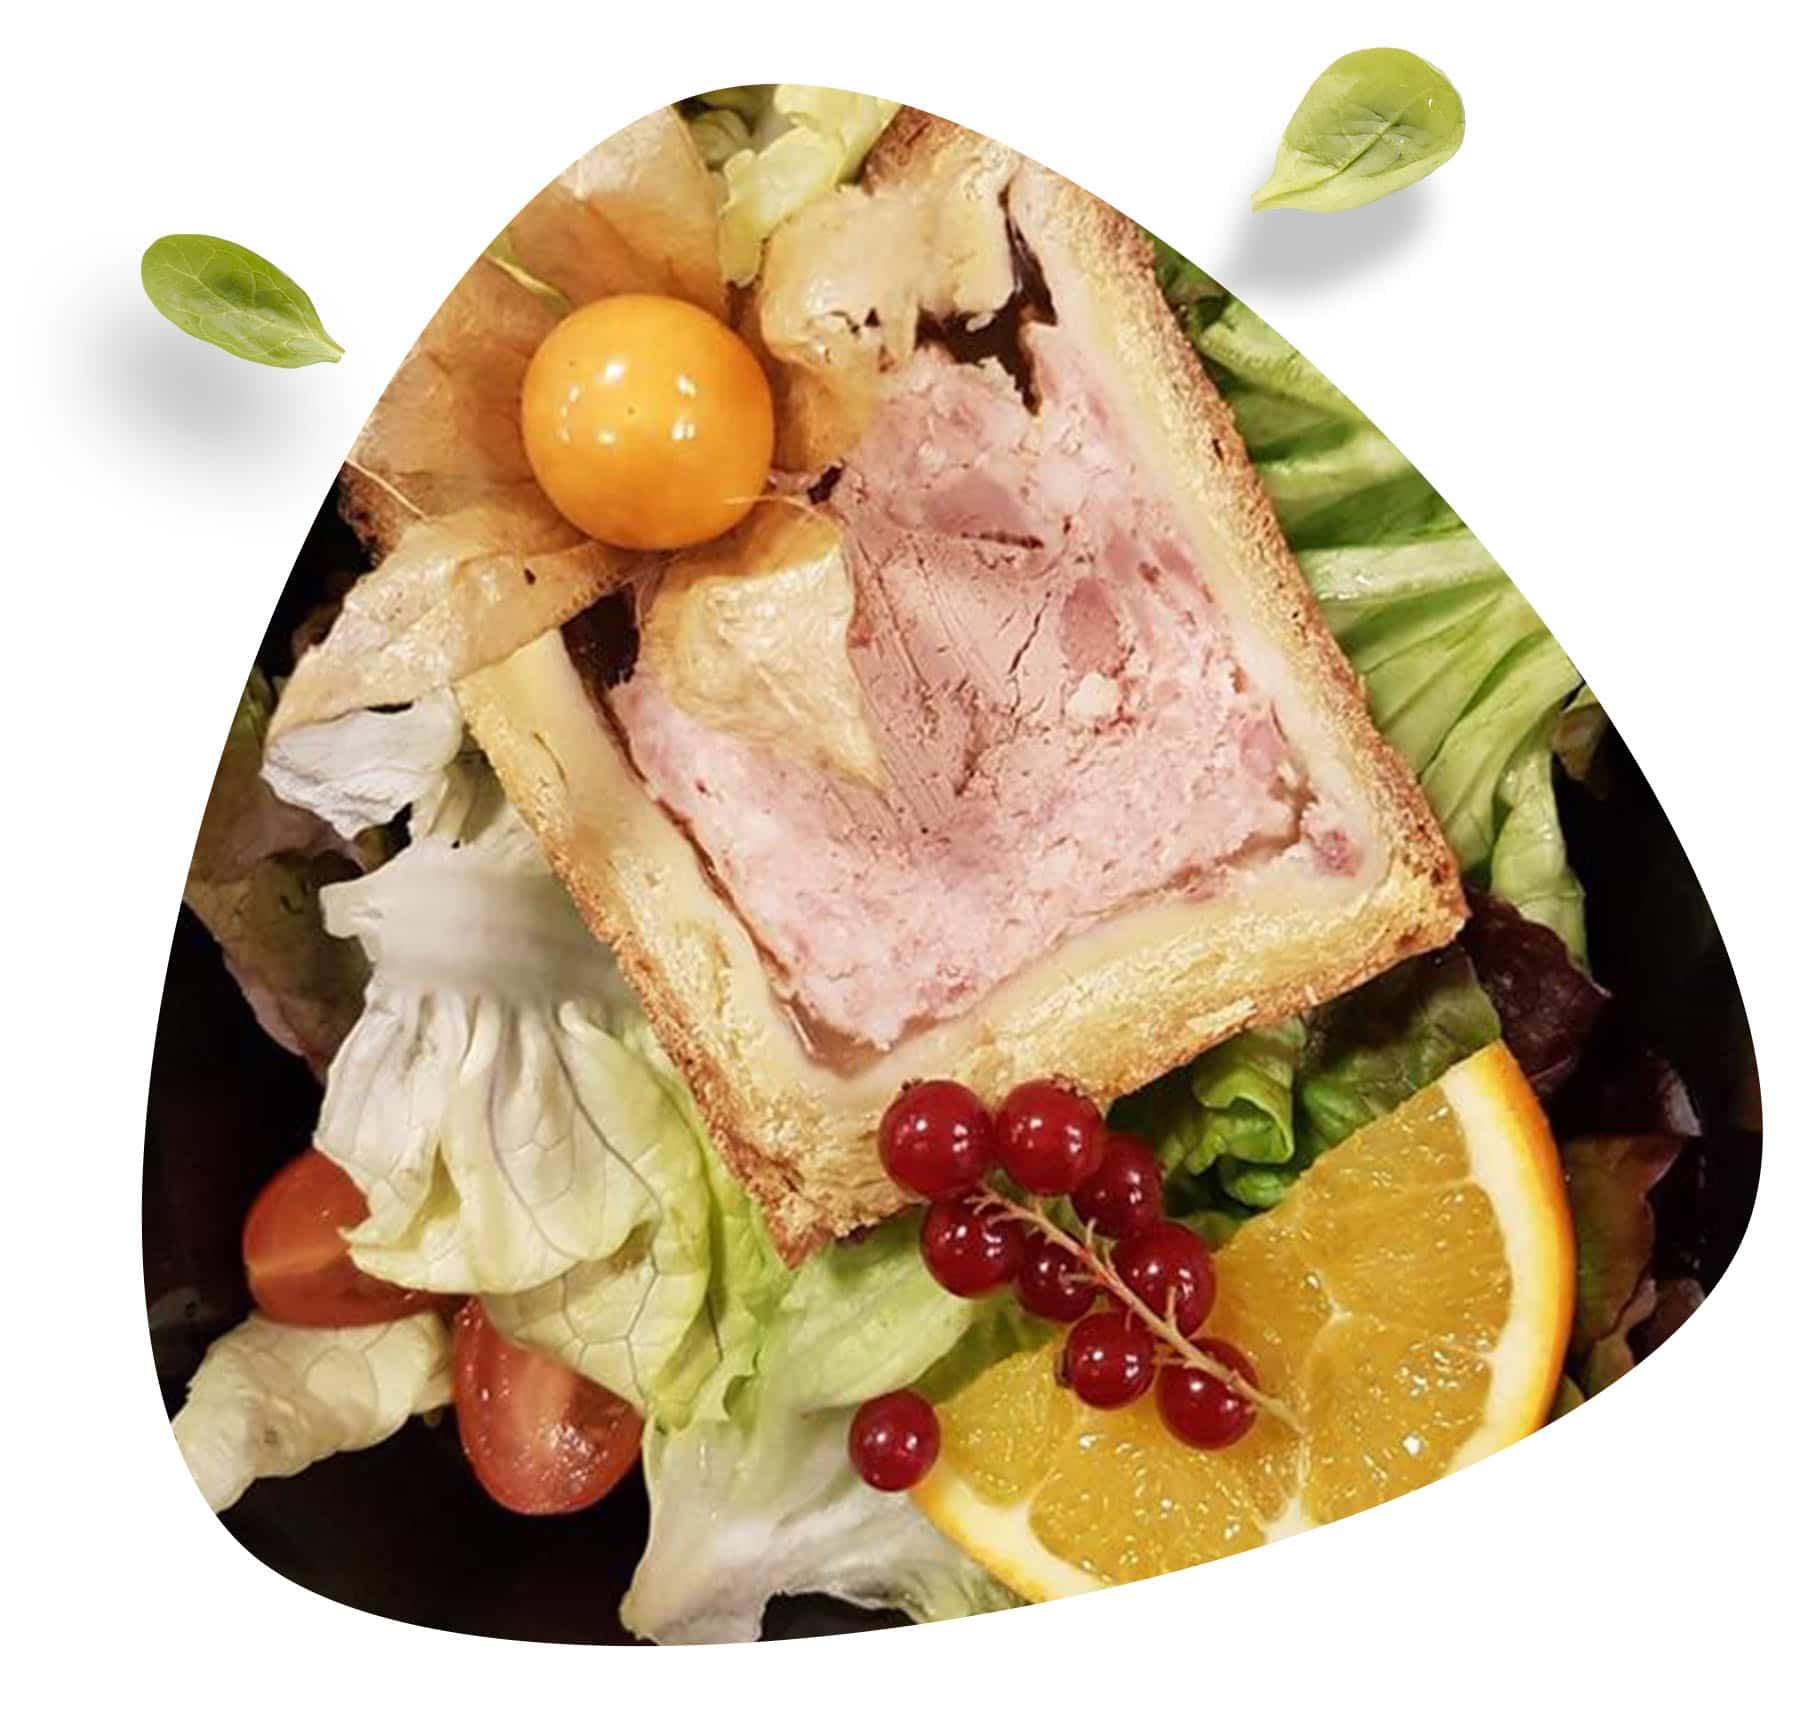 repas1-macuisine-bray